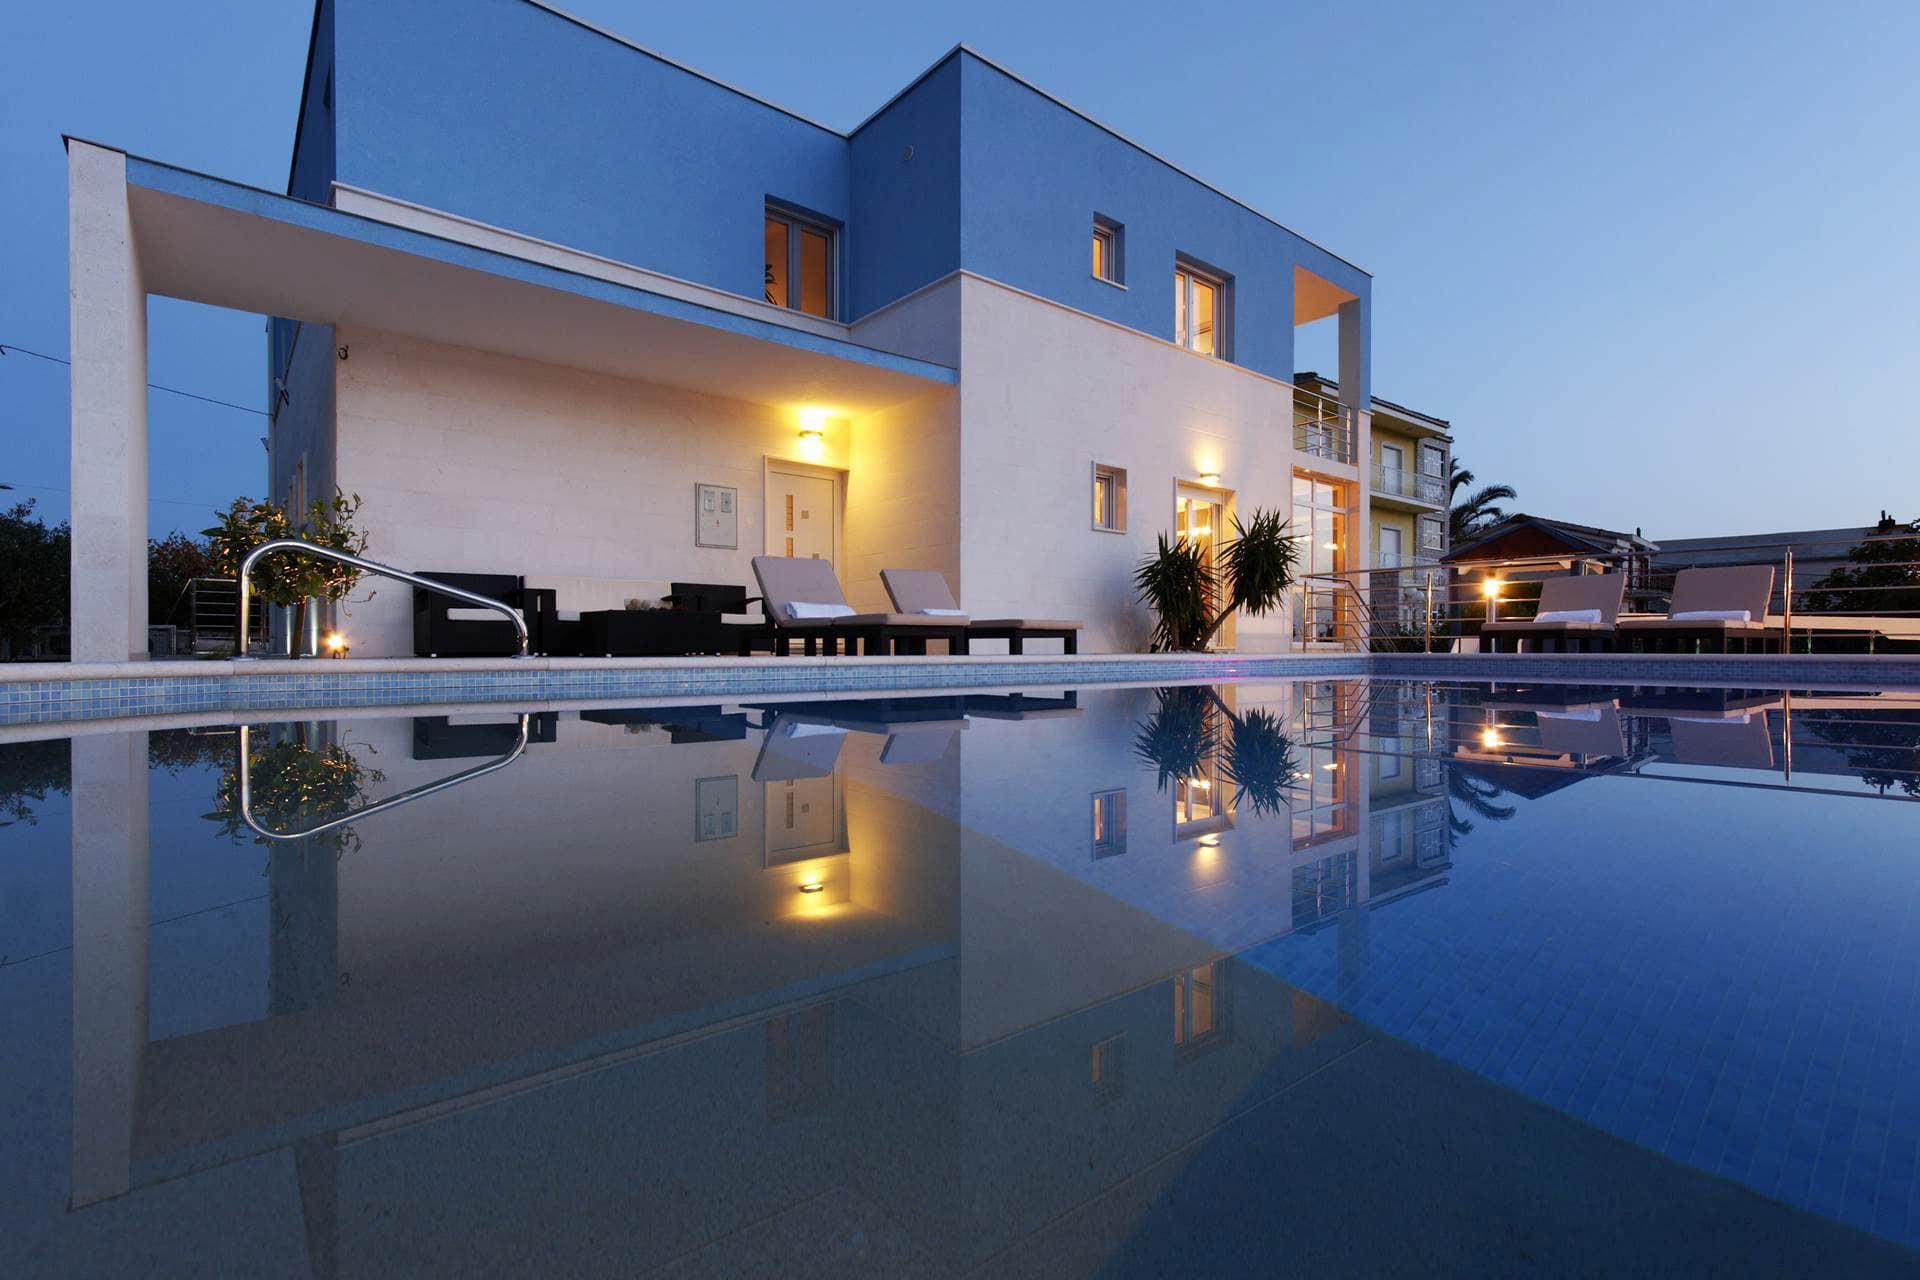 Moderna vila s bazenom i prekrasnim pogledom